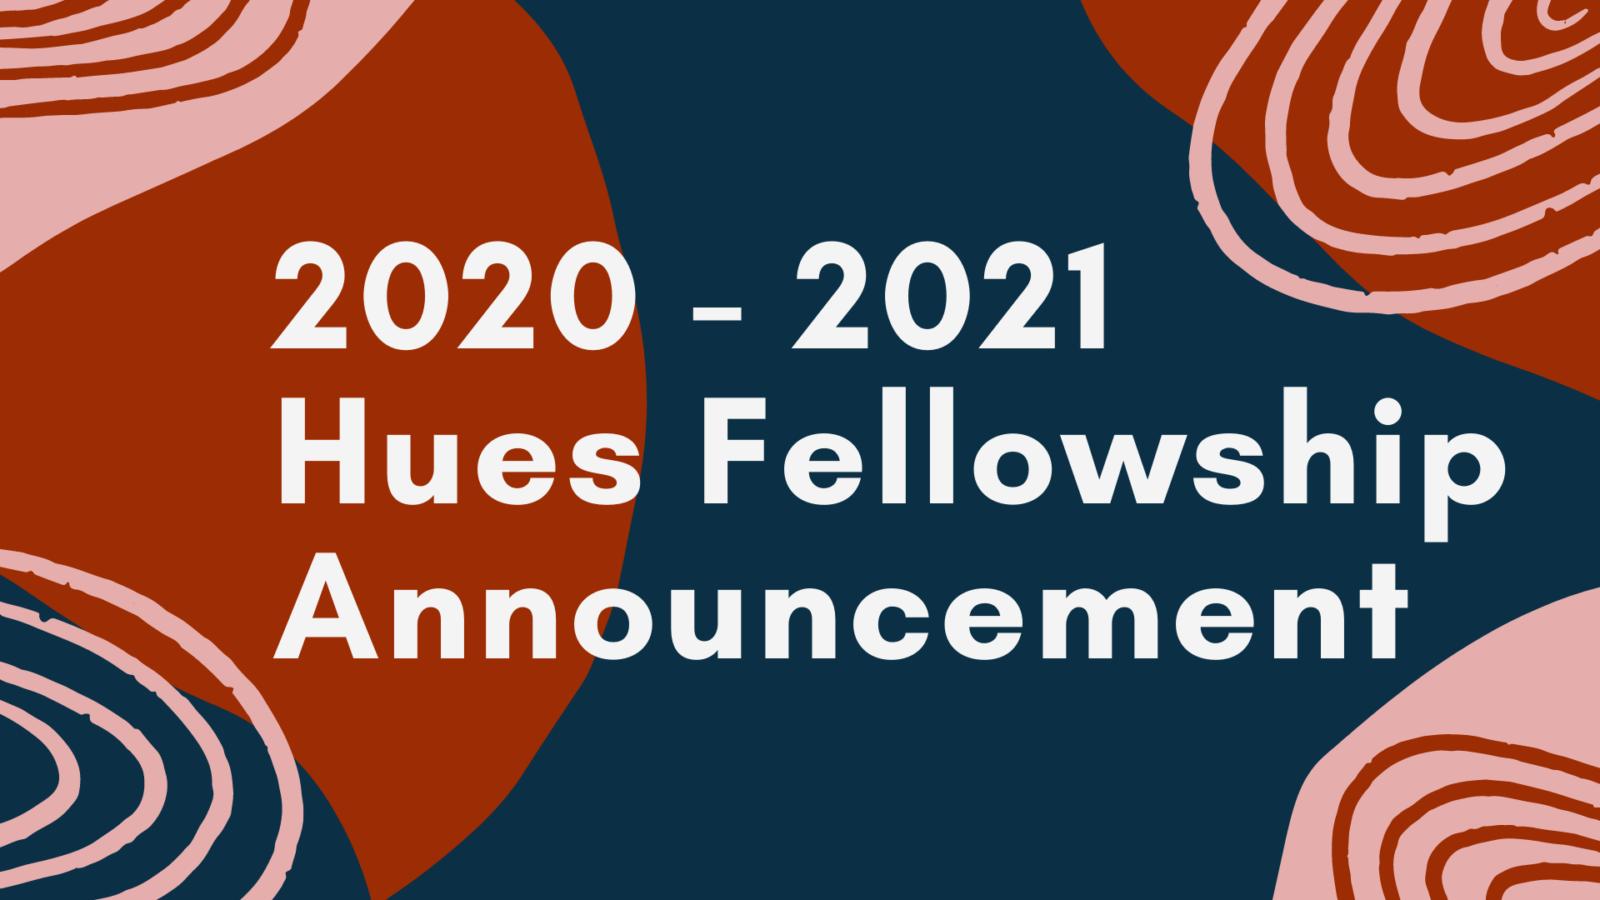 2020- 2021 Hues Fellowship Announcement